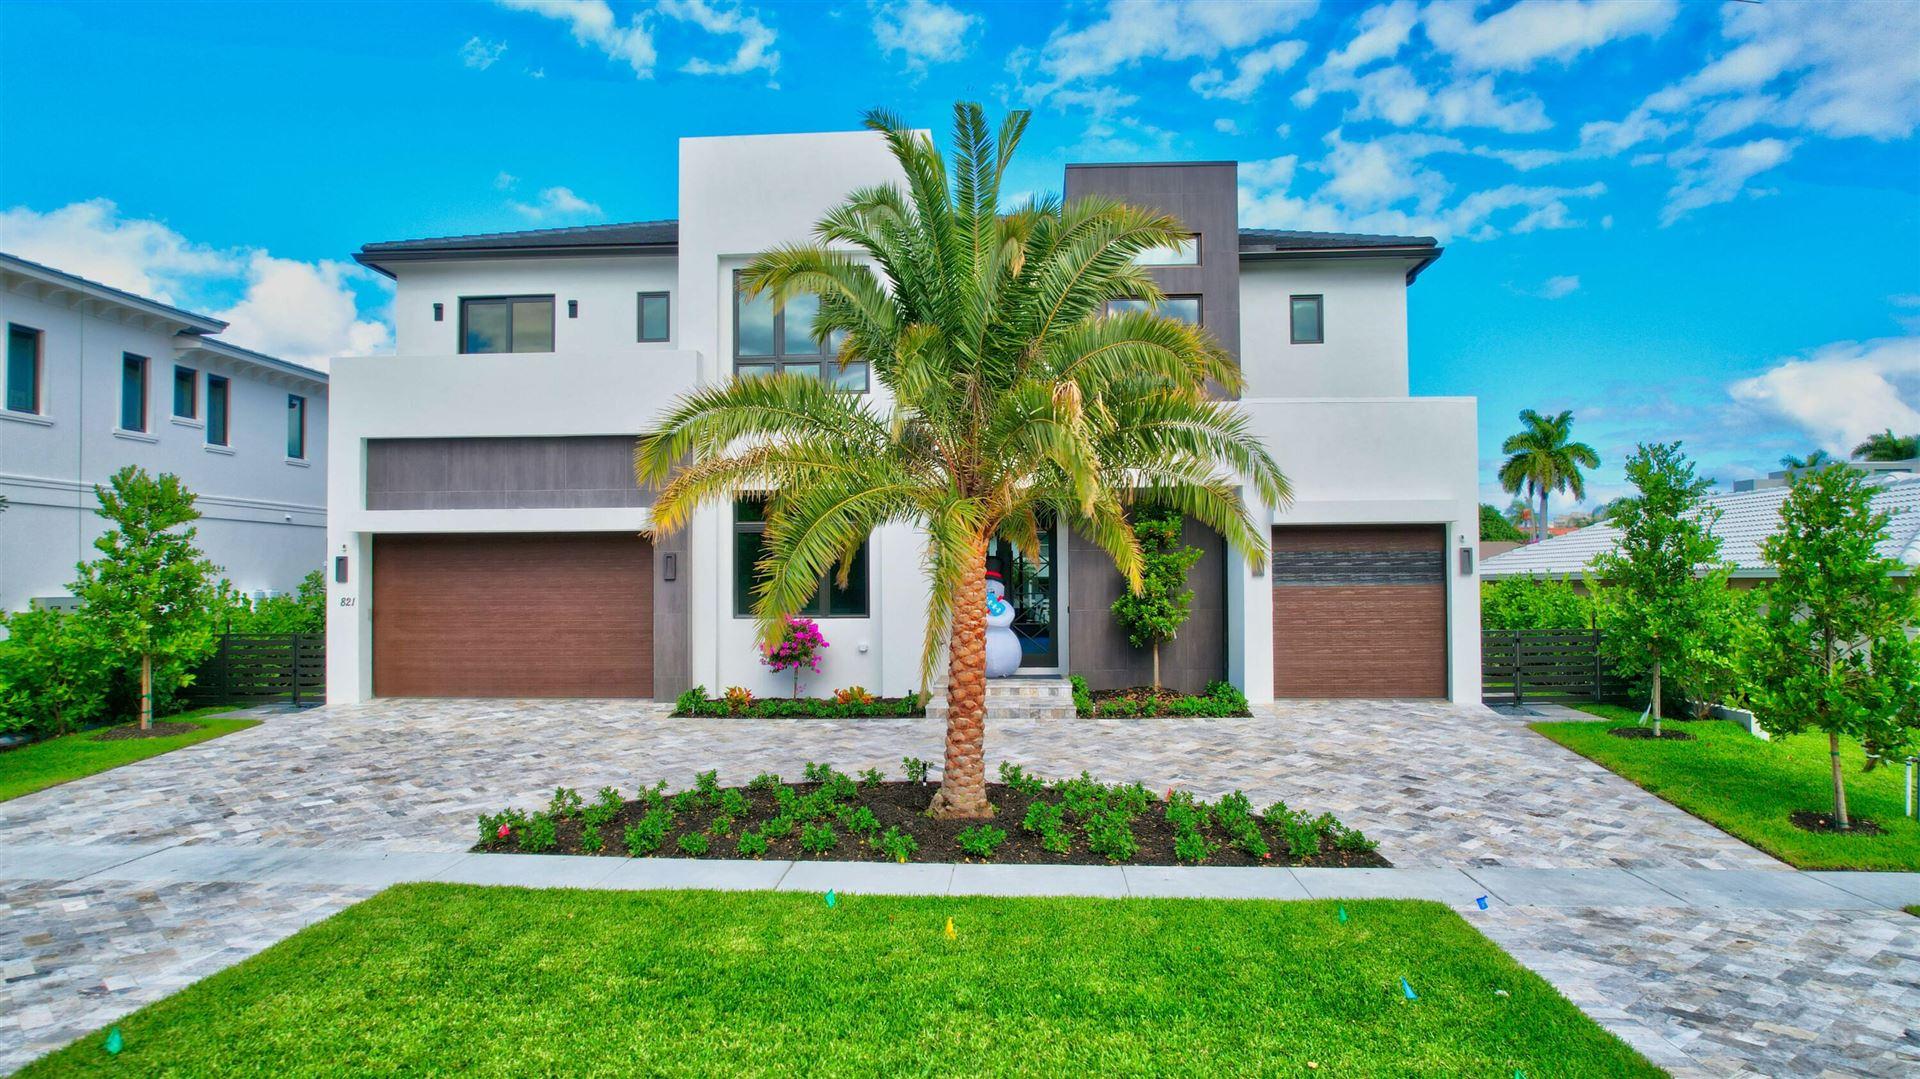 821 NE 32nd Street, Boca Raton, FL 33431 - MLS#: RX-10745111